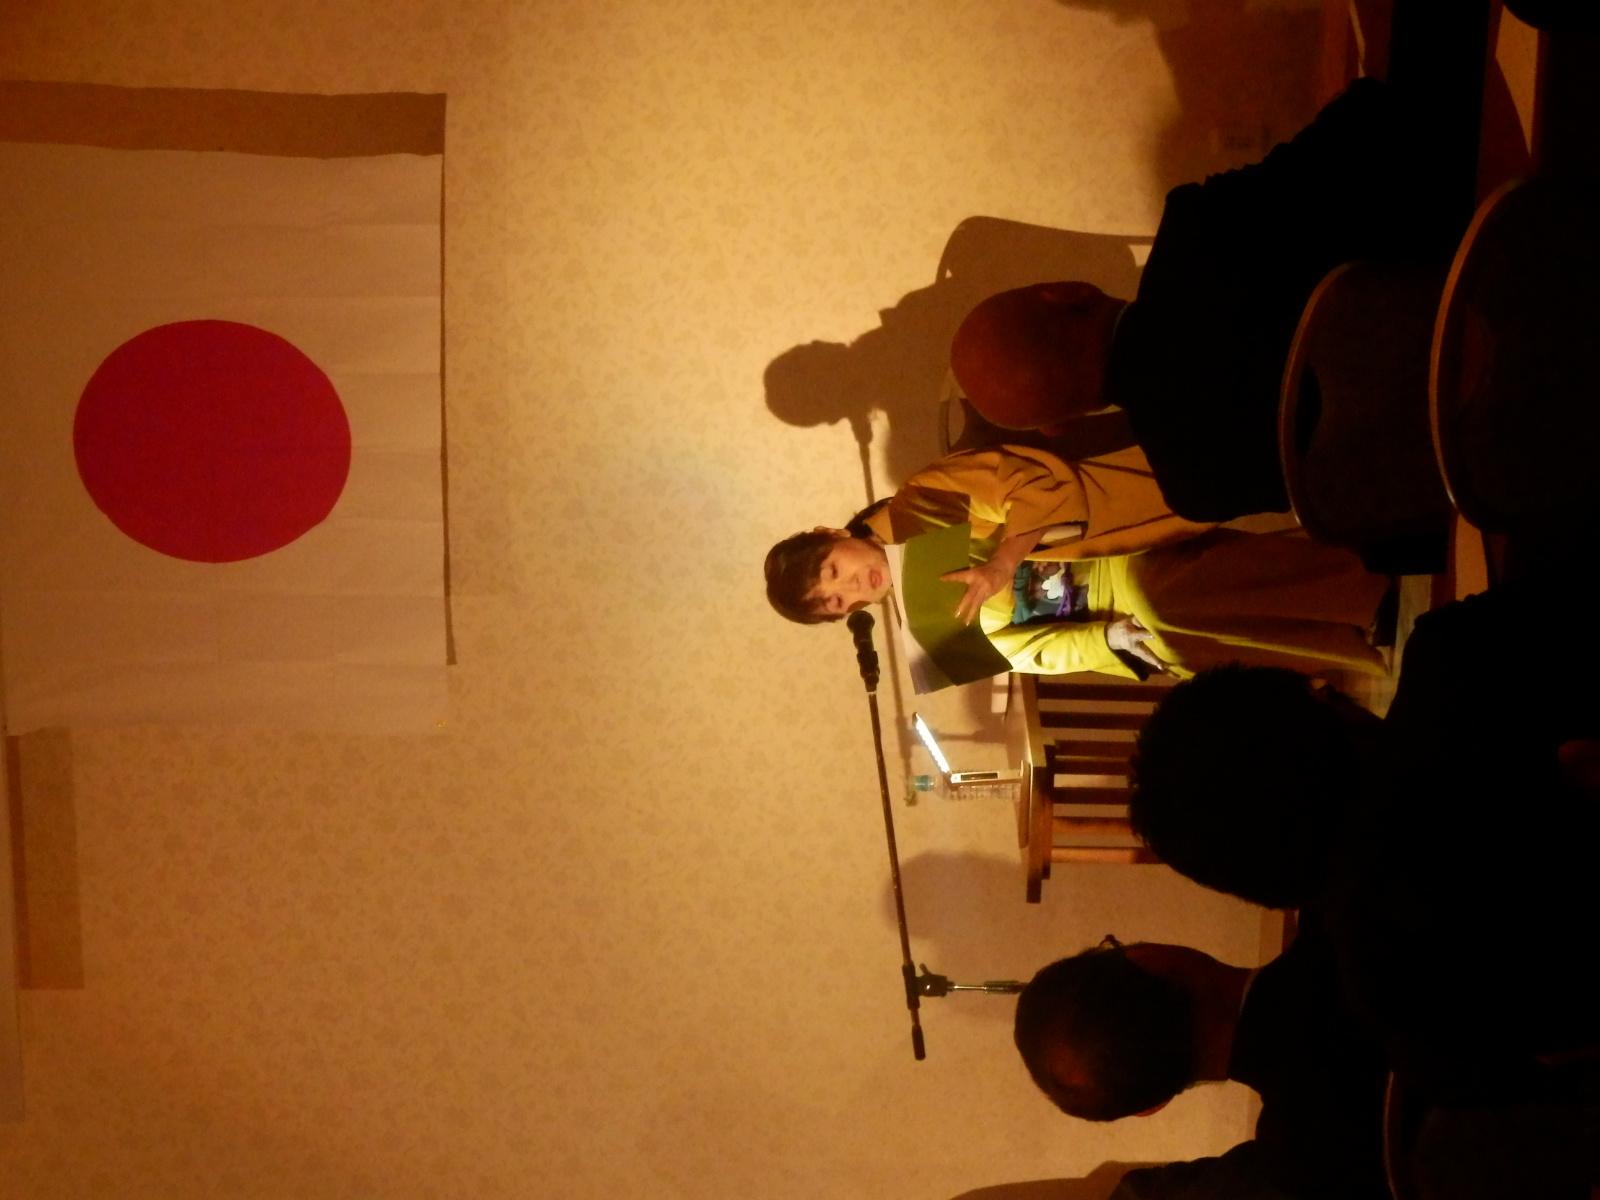 創立70周年記念公演「日本神話イザナミ語り」 小山茉美先生(声優)